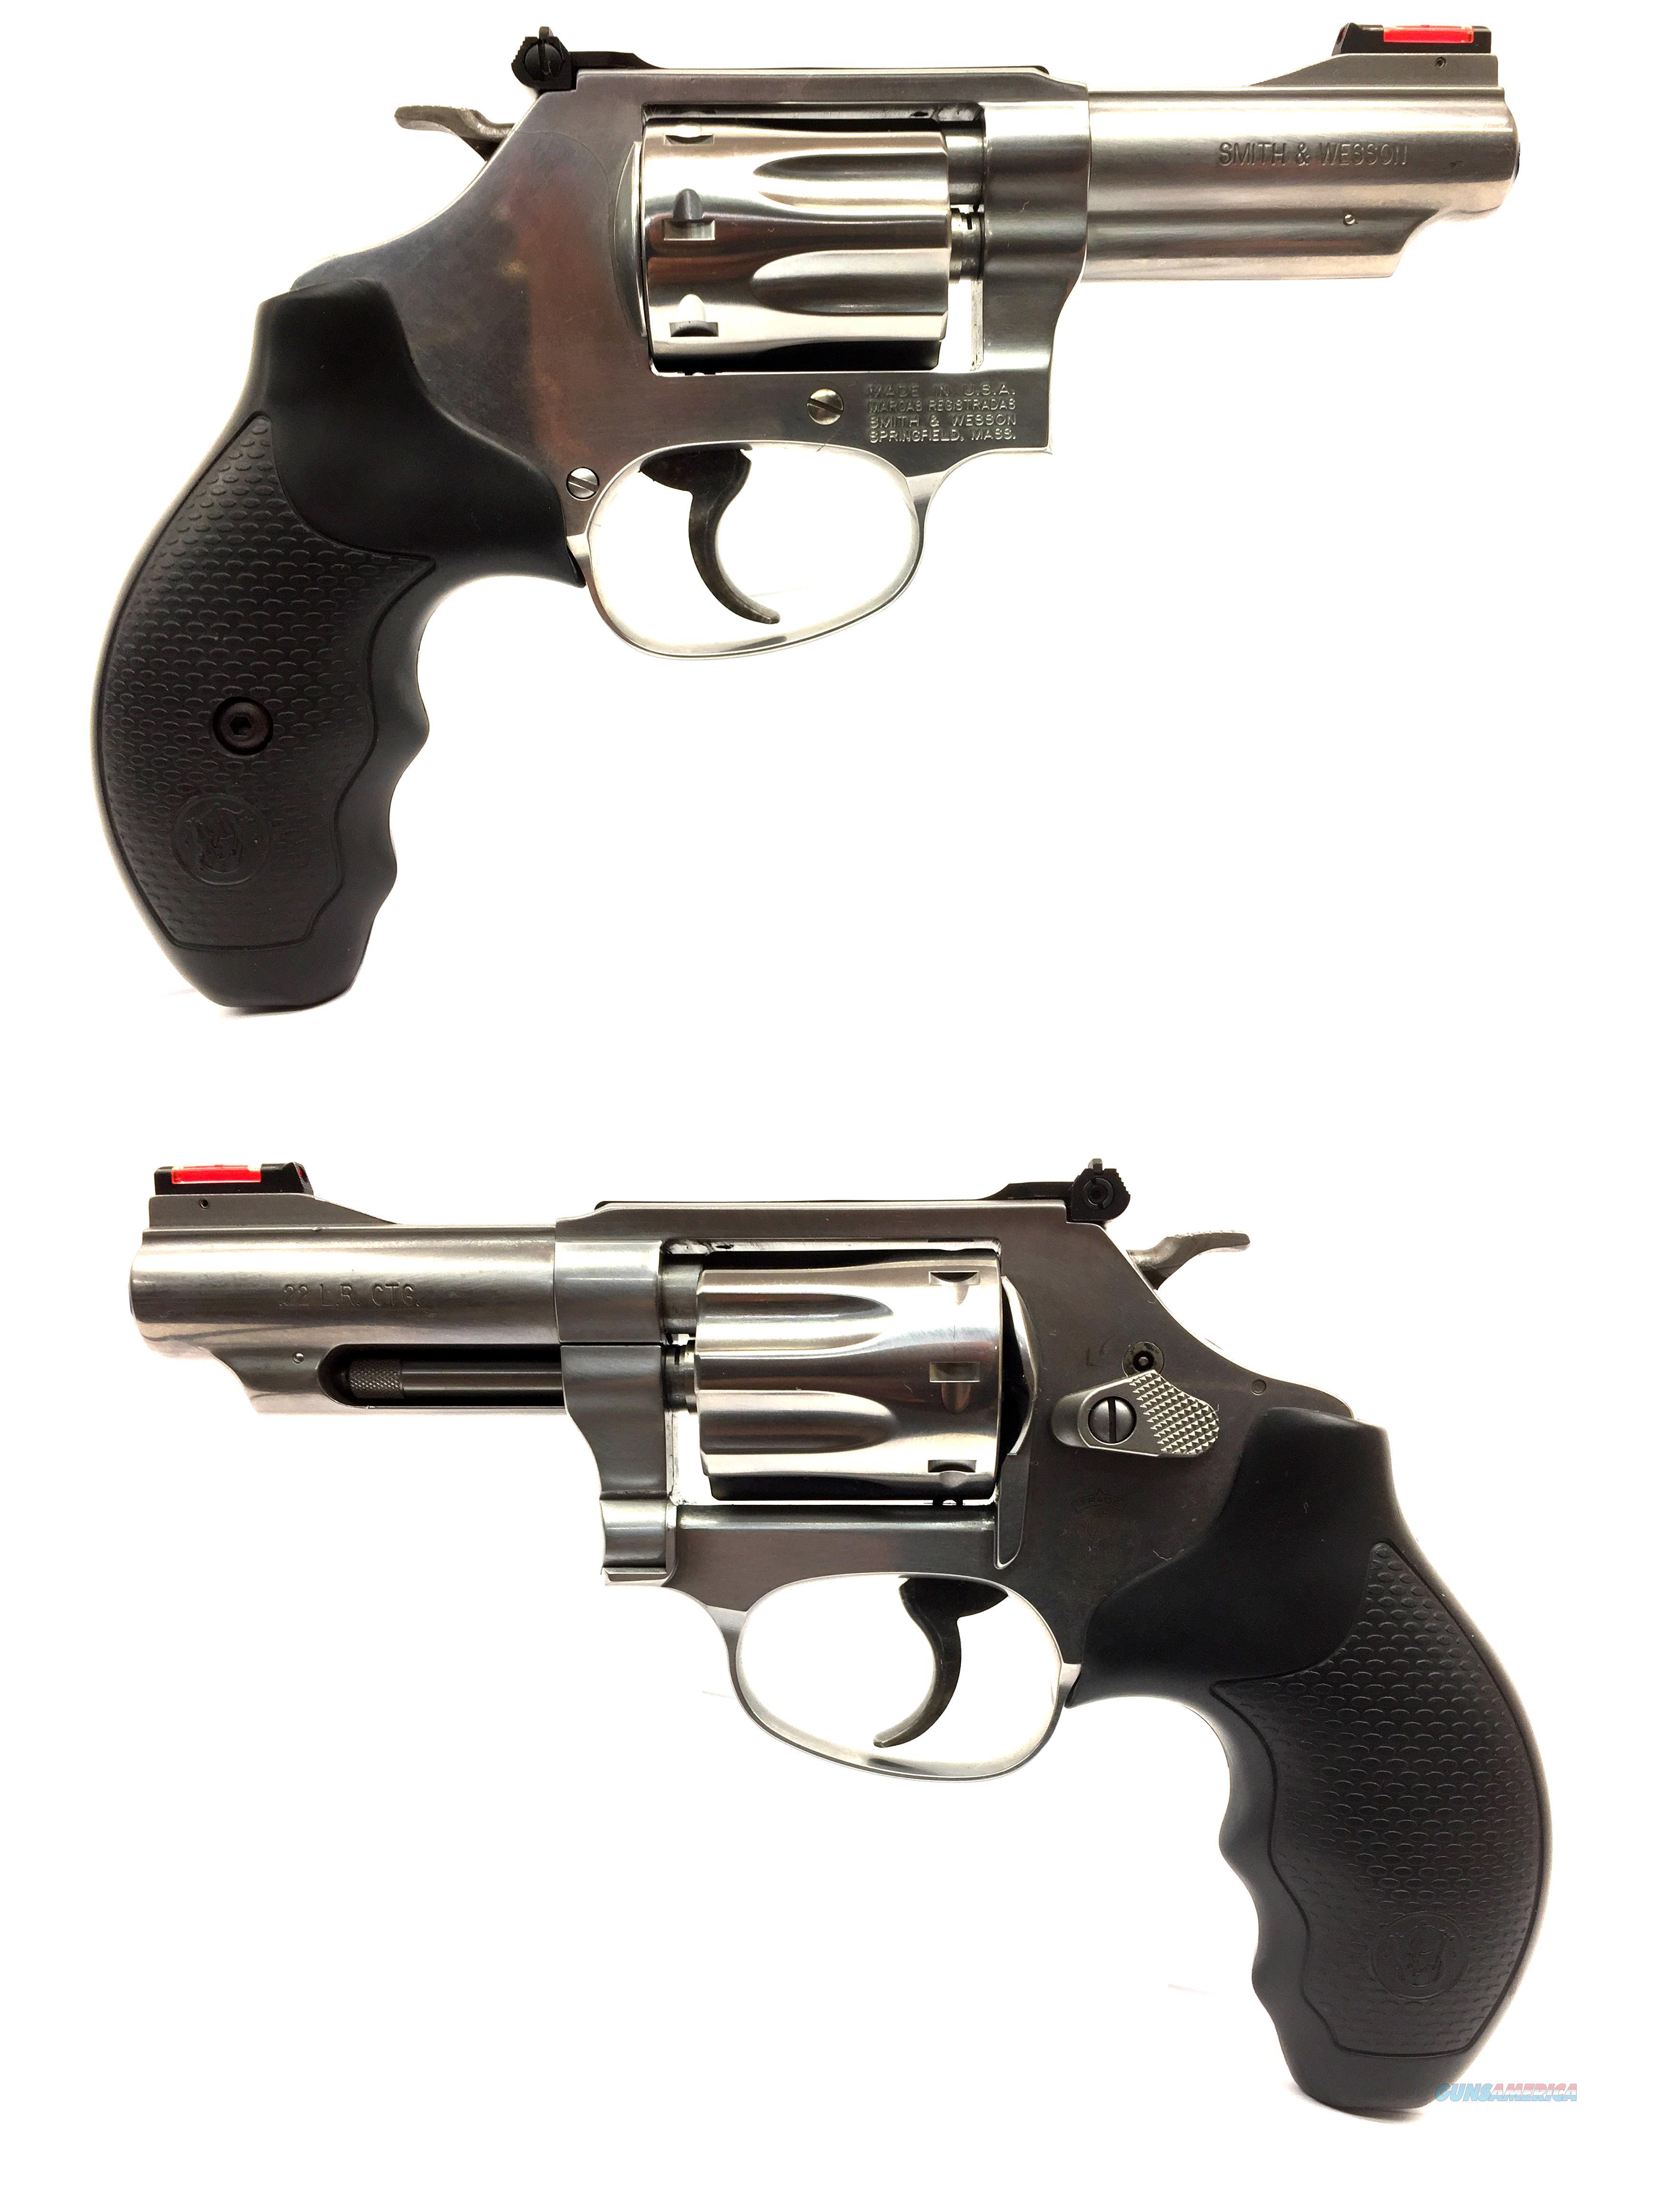 Smith & Wesson Model 63-5 Revolver  Guns > Pistols > Smith & Wesson Revolvers > Small Frame ( J )